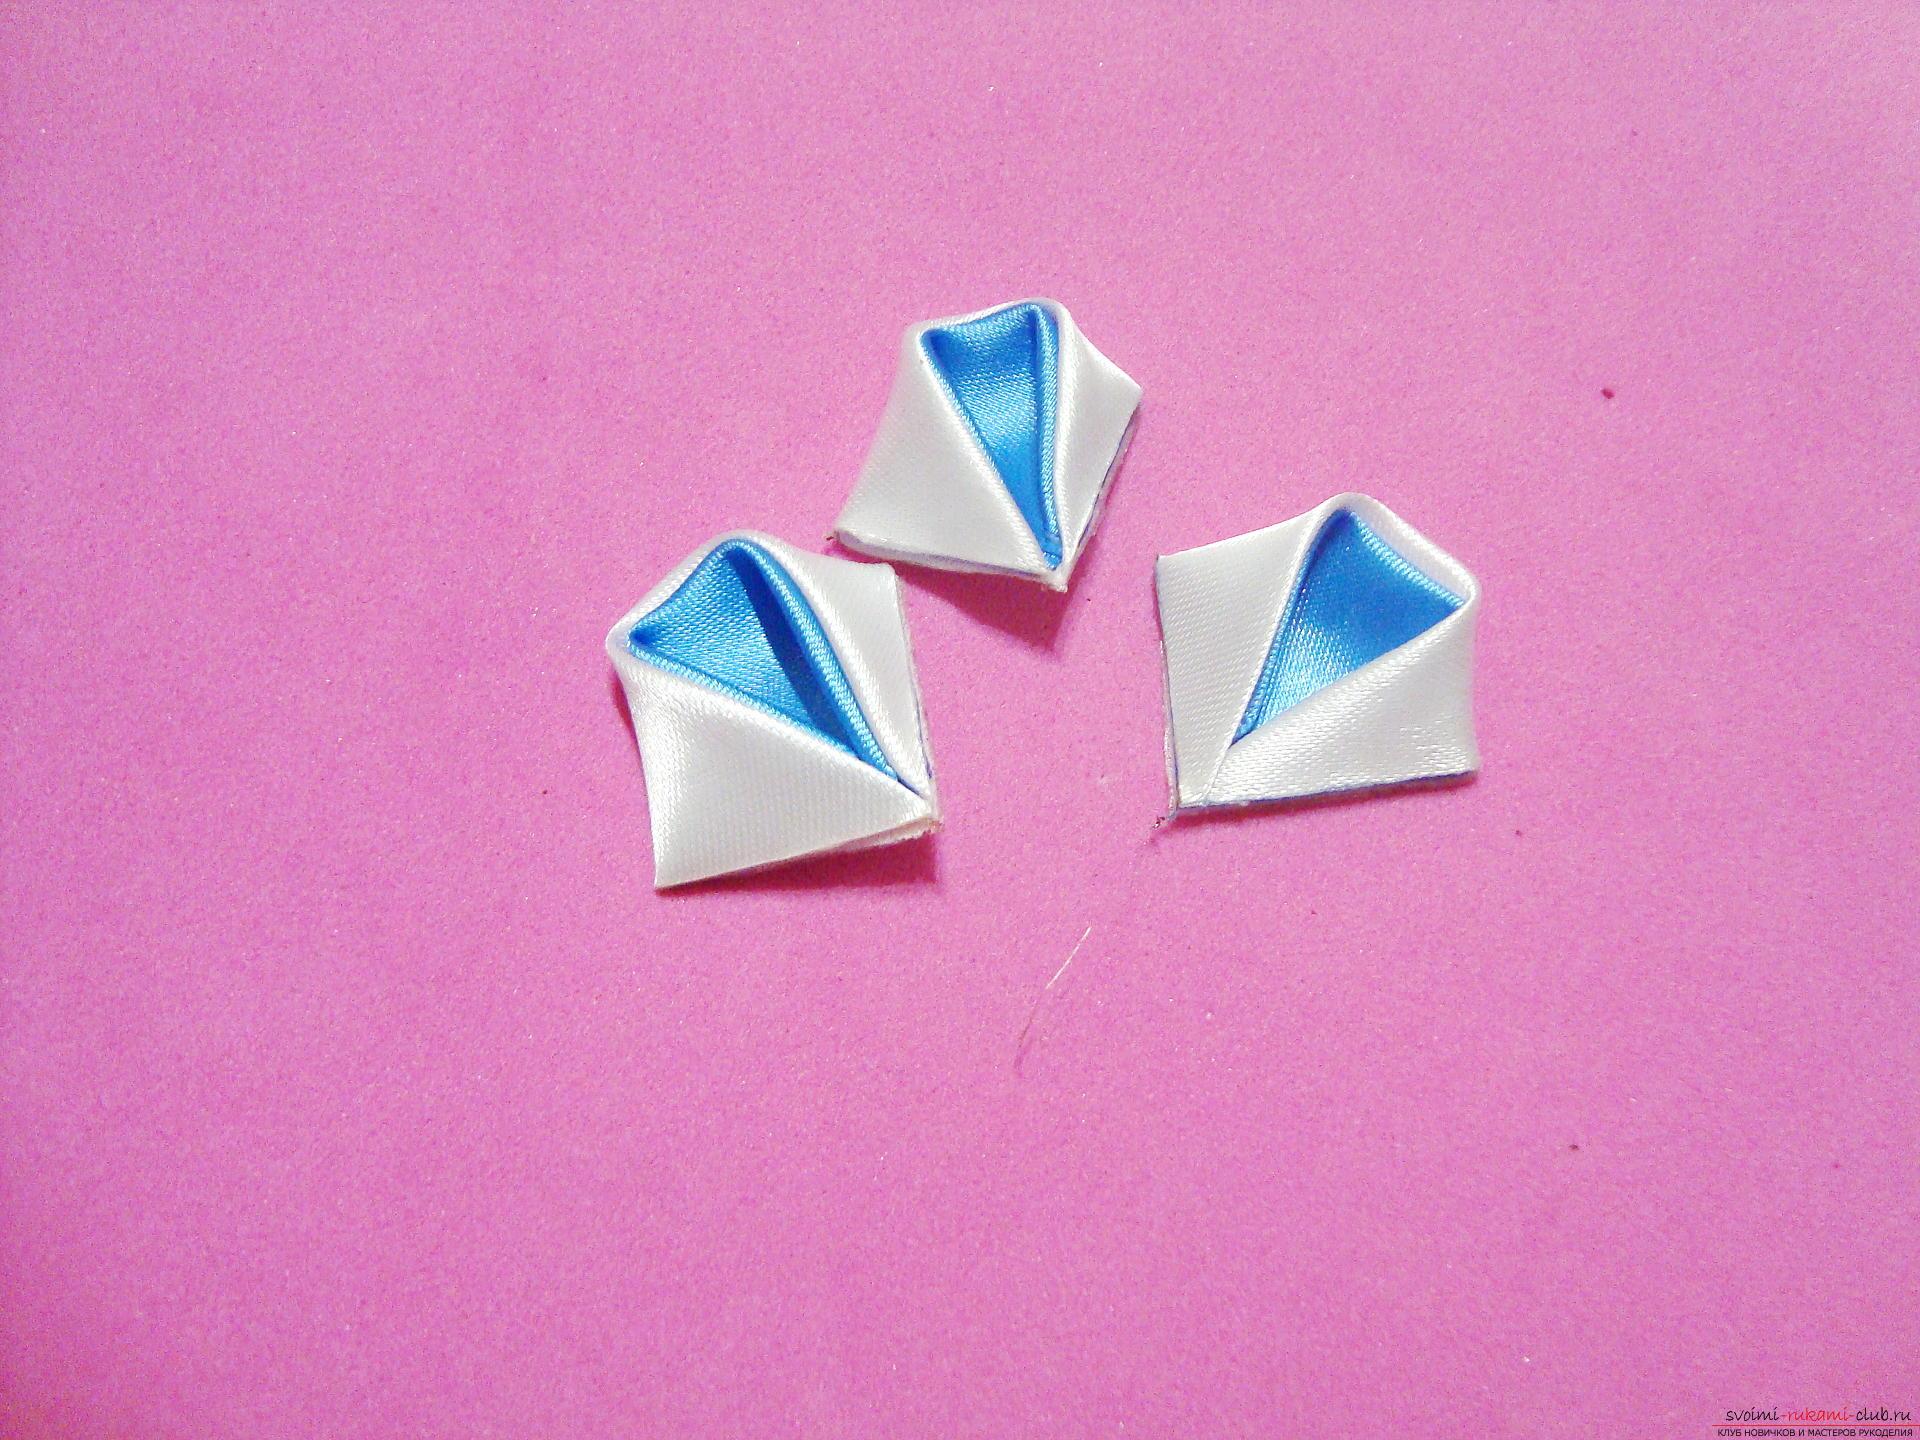 Фото инструкция по изготовлению заколки из лент голубого цвета в технике канзаши. Фото №7